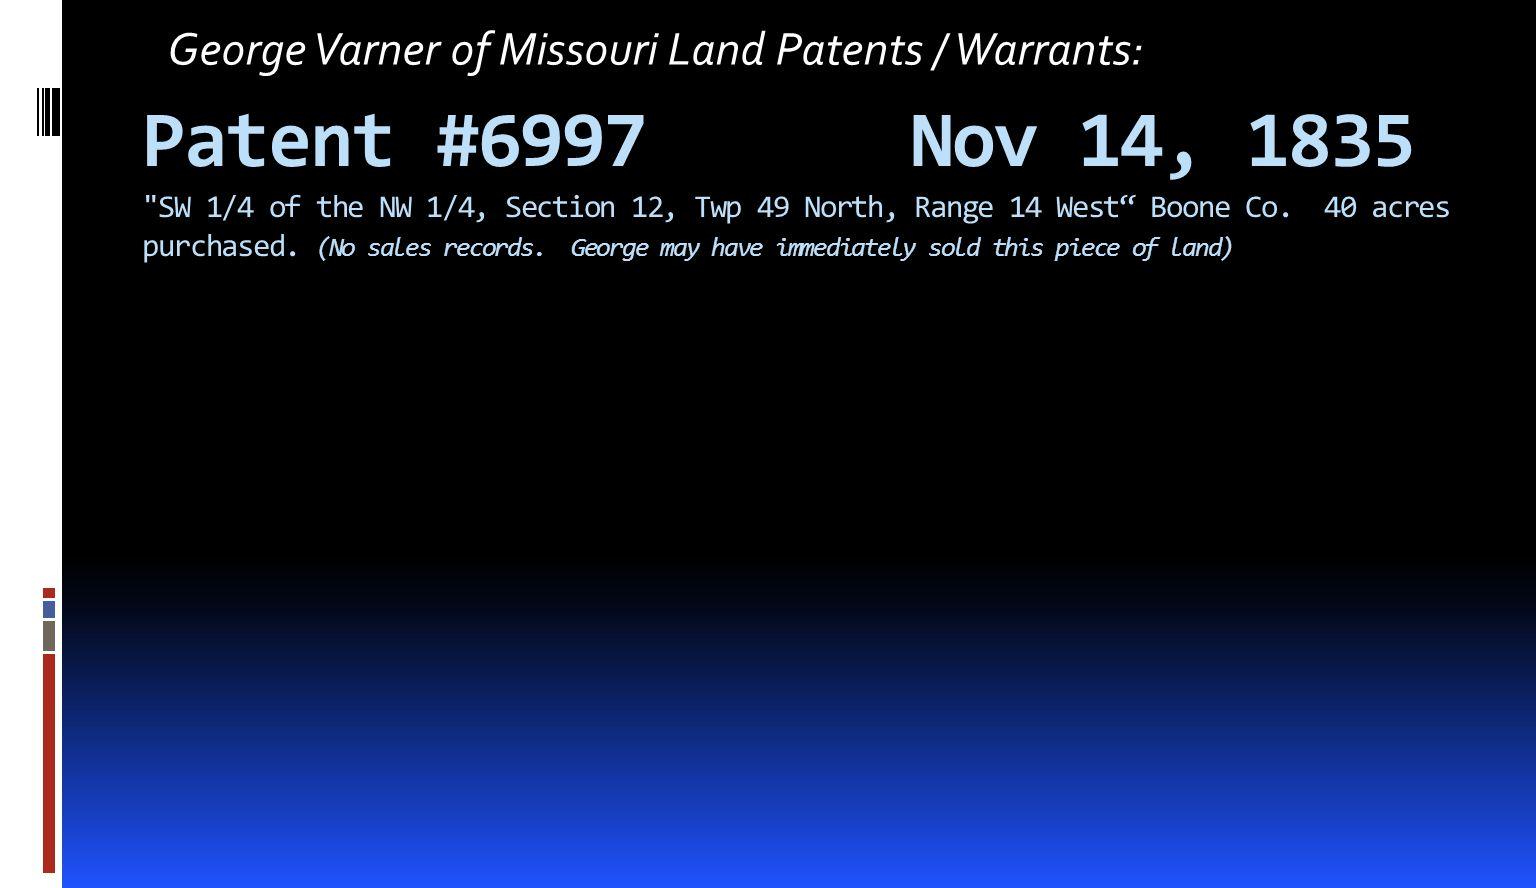 George Varner of Missouri Land Patents / Warrants: